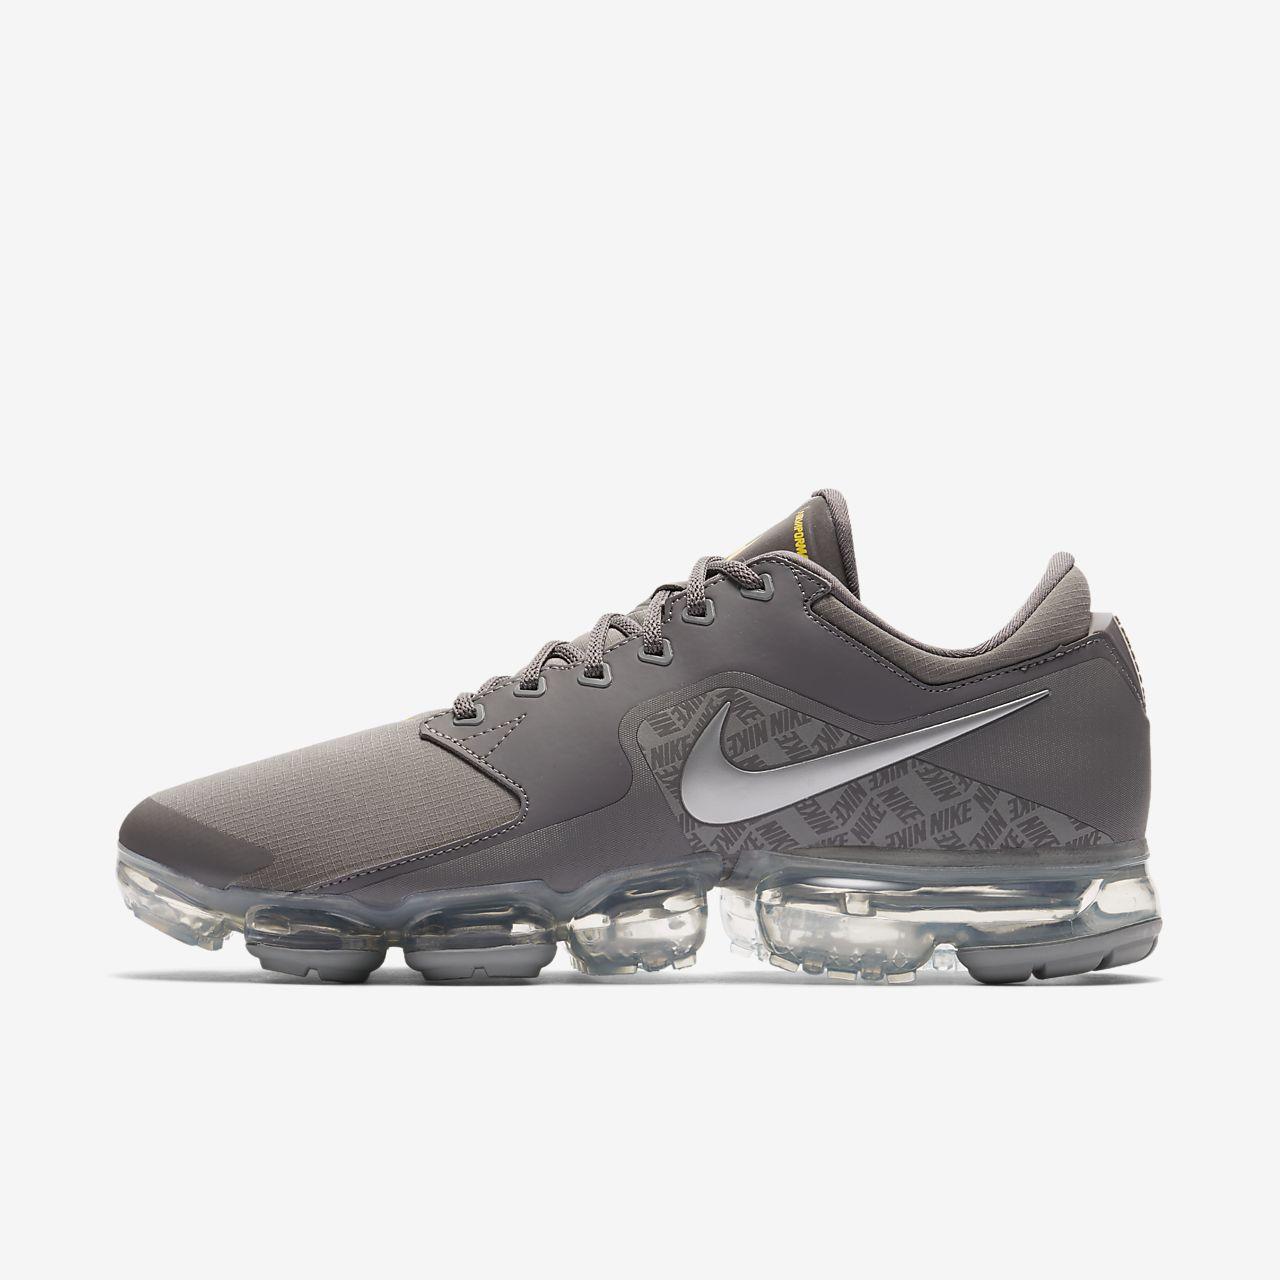 huge discount a2a34 c6fb8 Running Air Uomo Nike Da Scarpa It Vapormax q0Z5TT